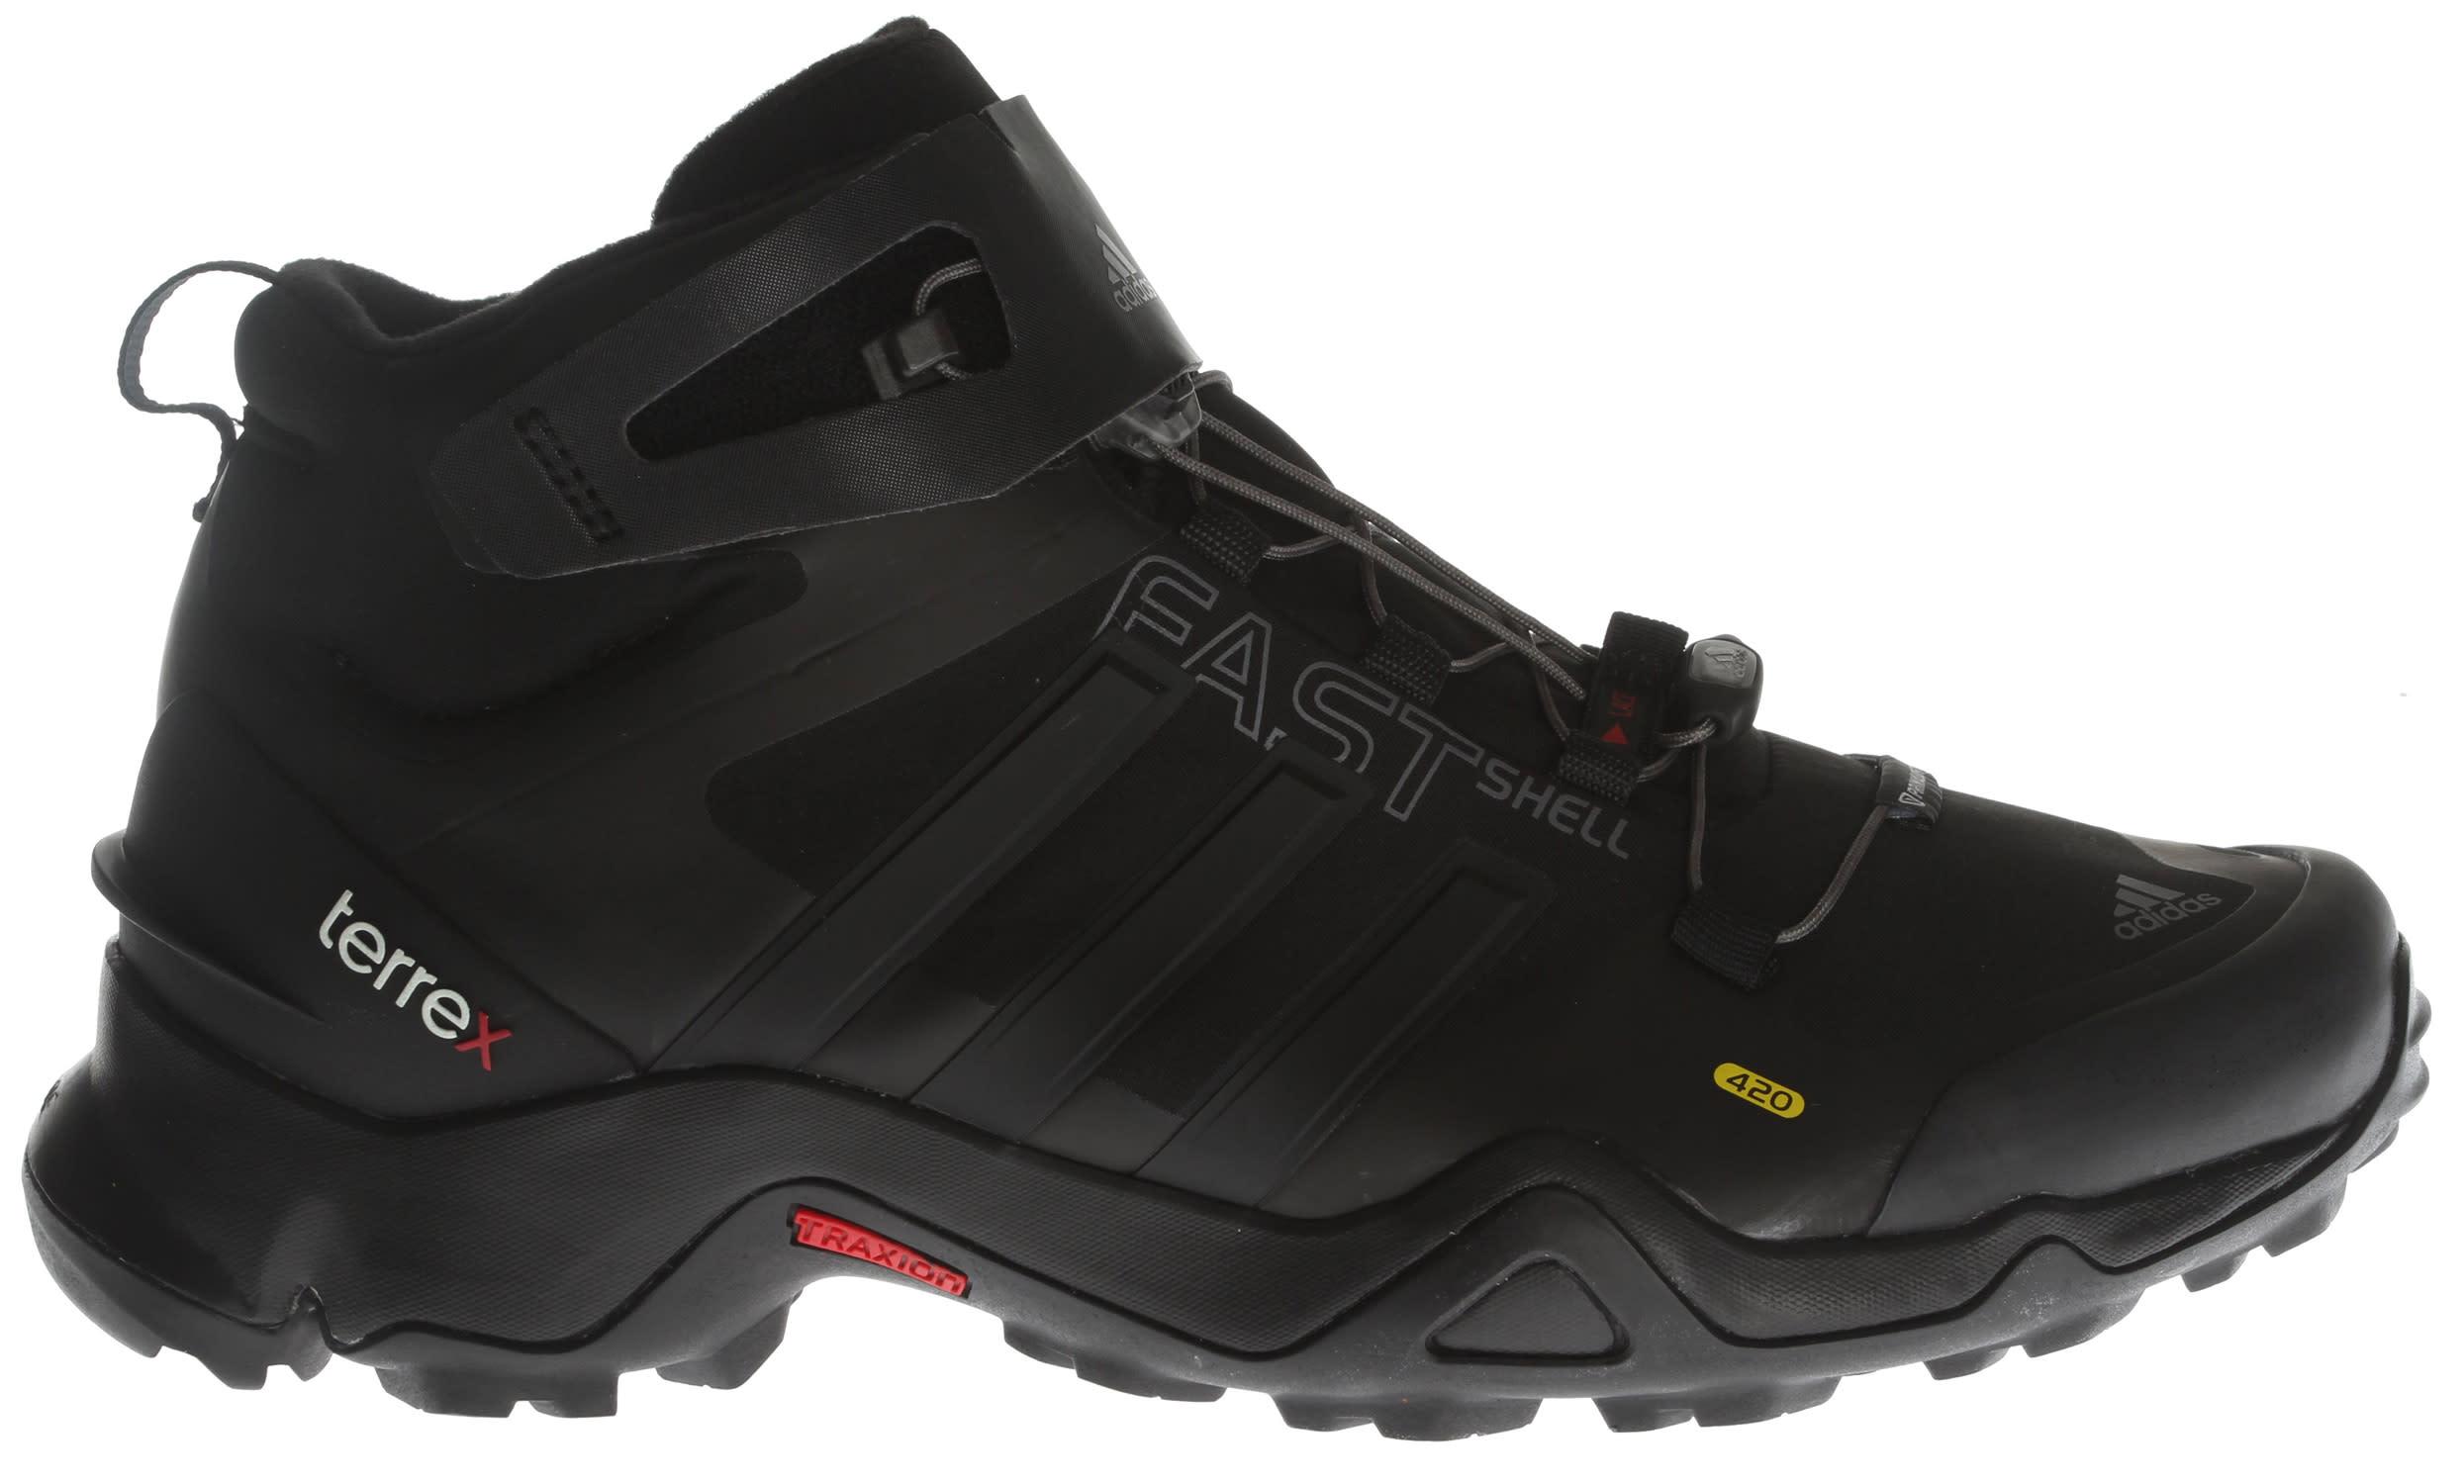 Adidas Terrex Fastshell Mid Hiking Boots Mens EBay